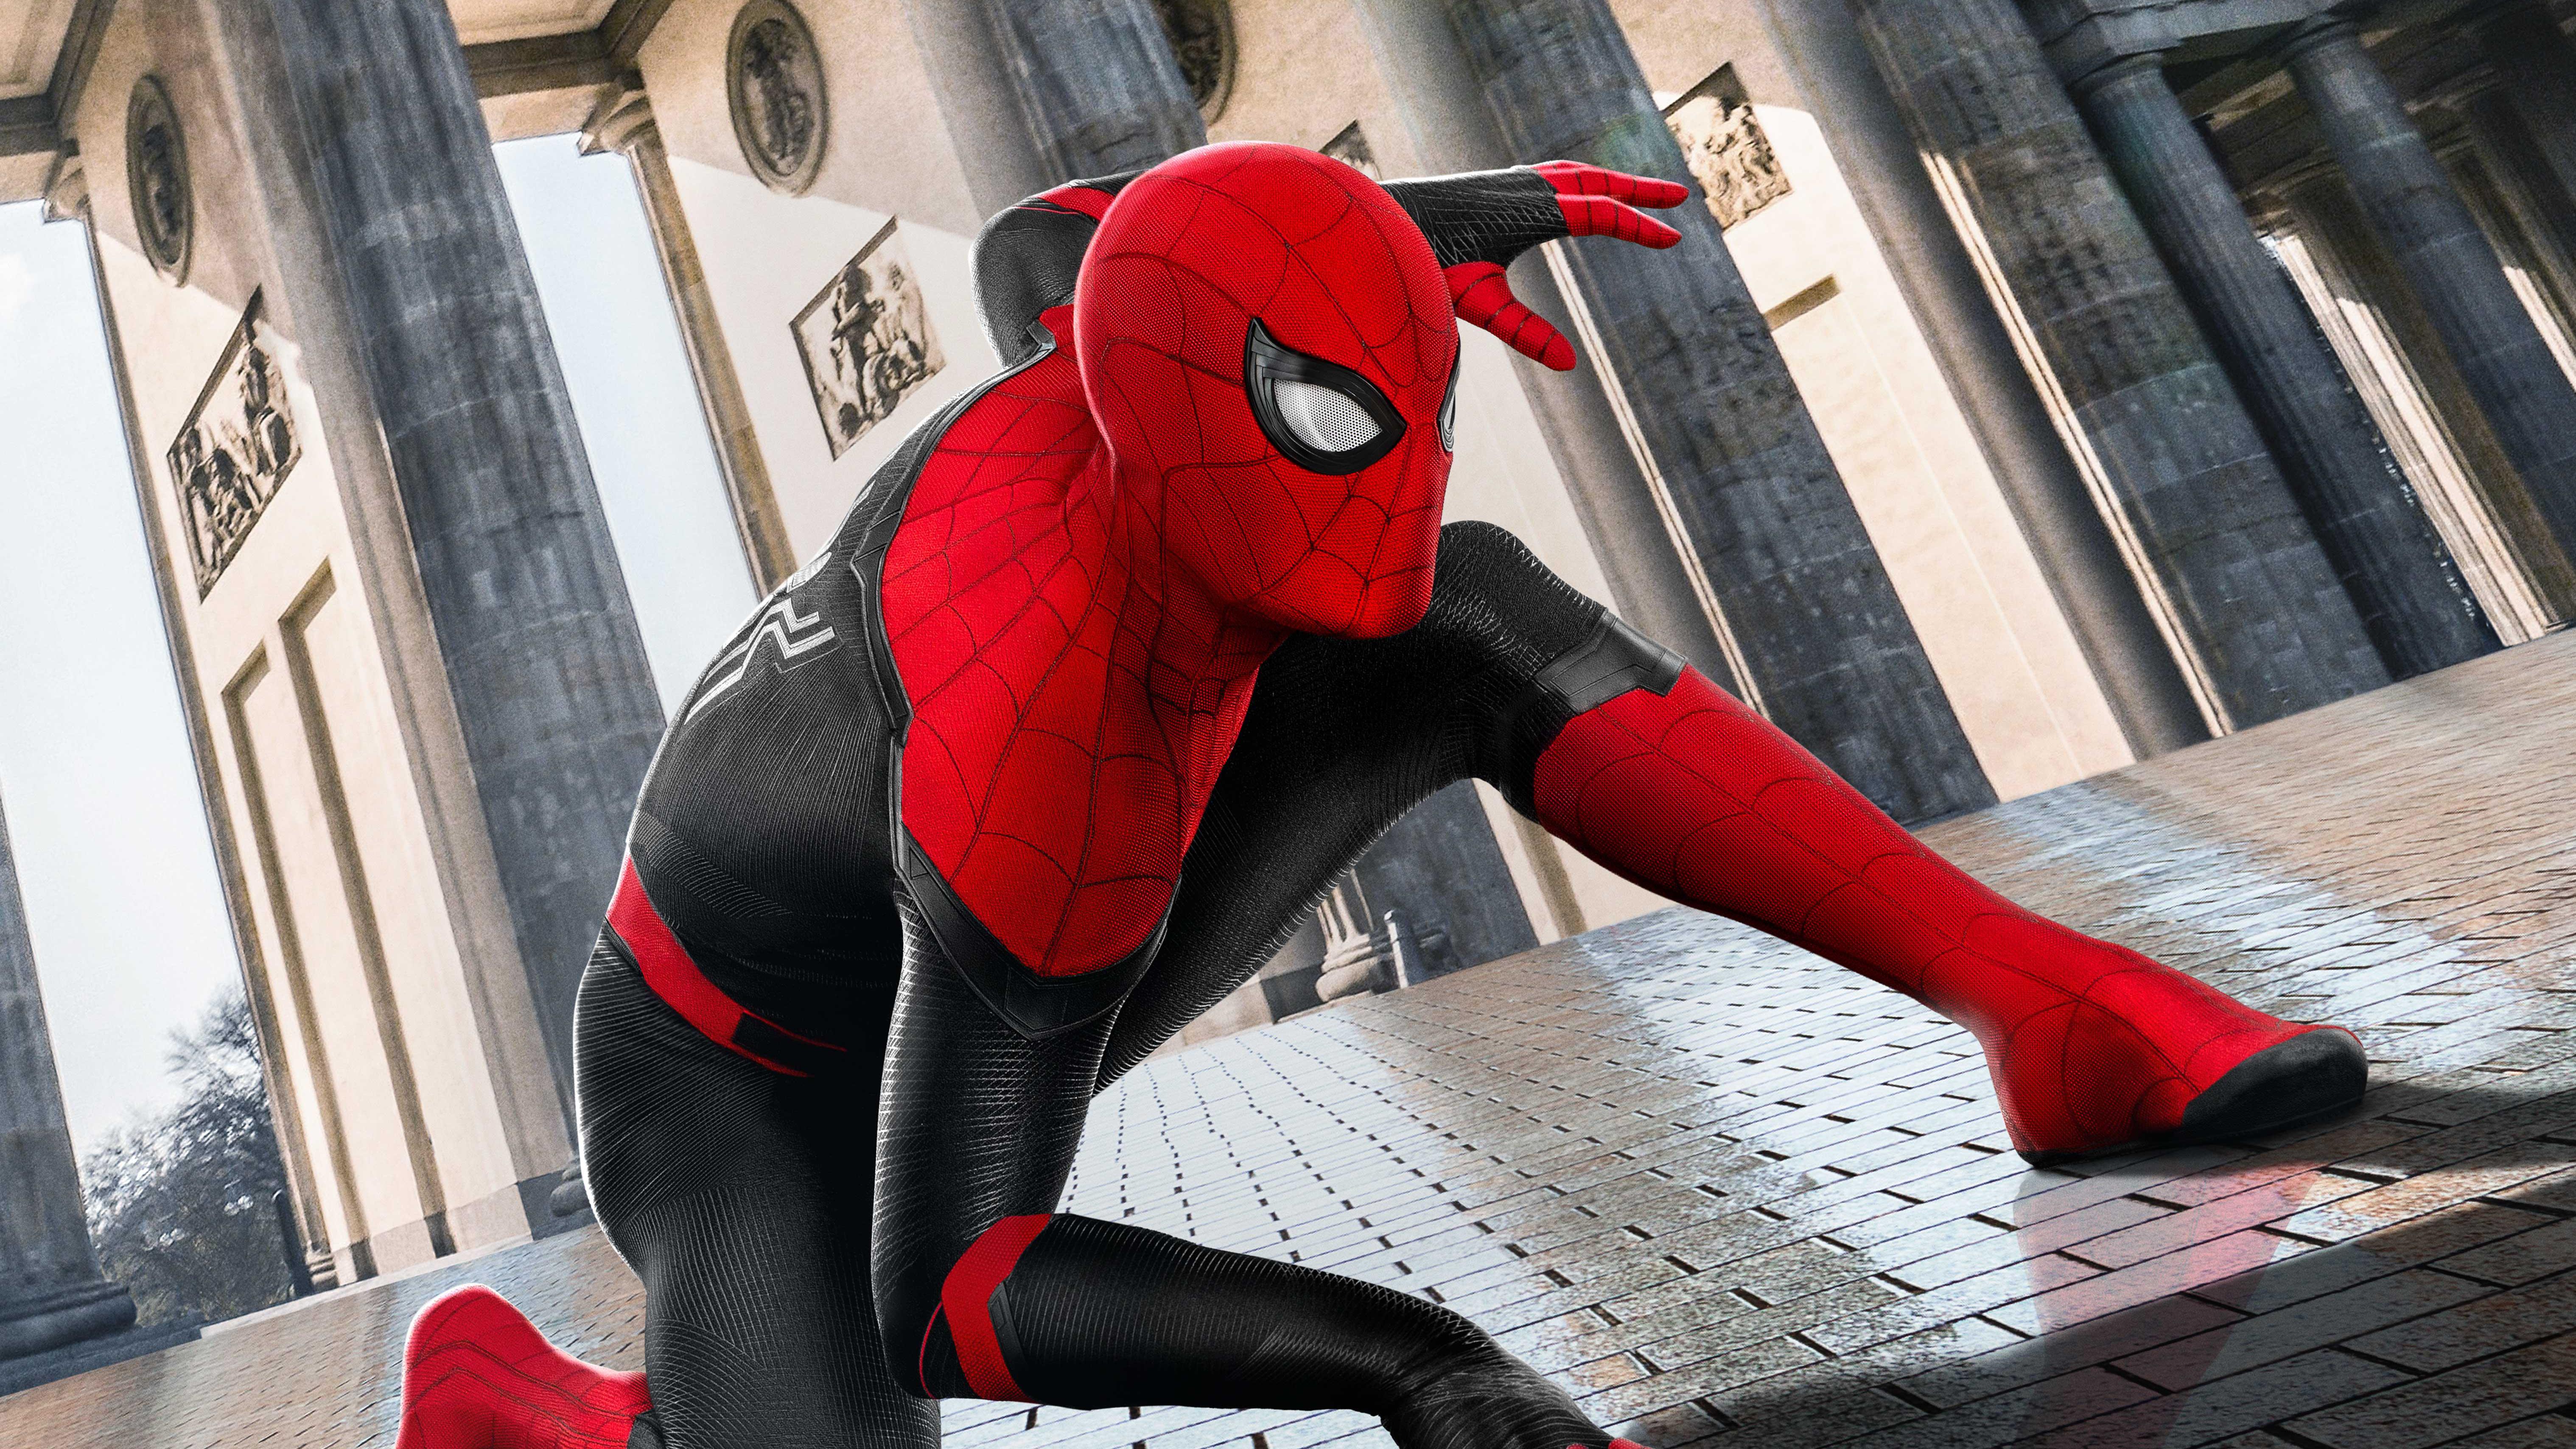 2048x1152 Spider Man Far From Home 5k 2048x1152 Resolution Hd 4k